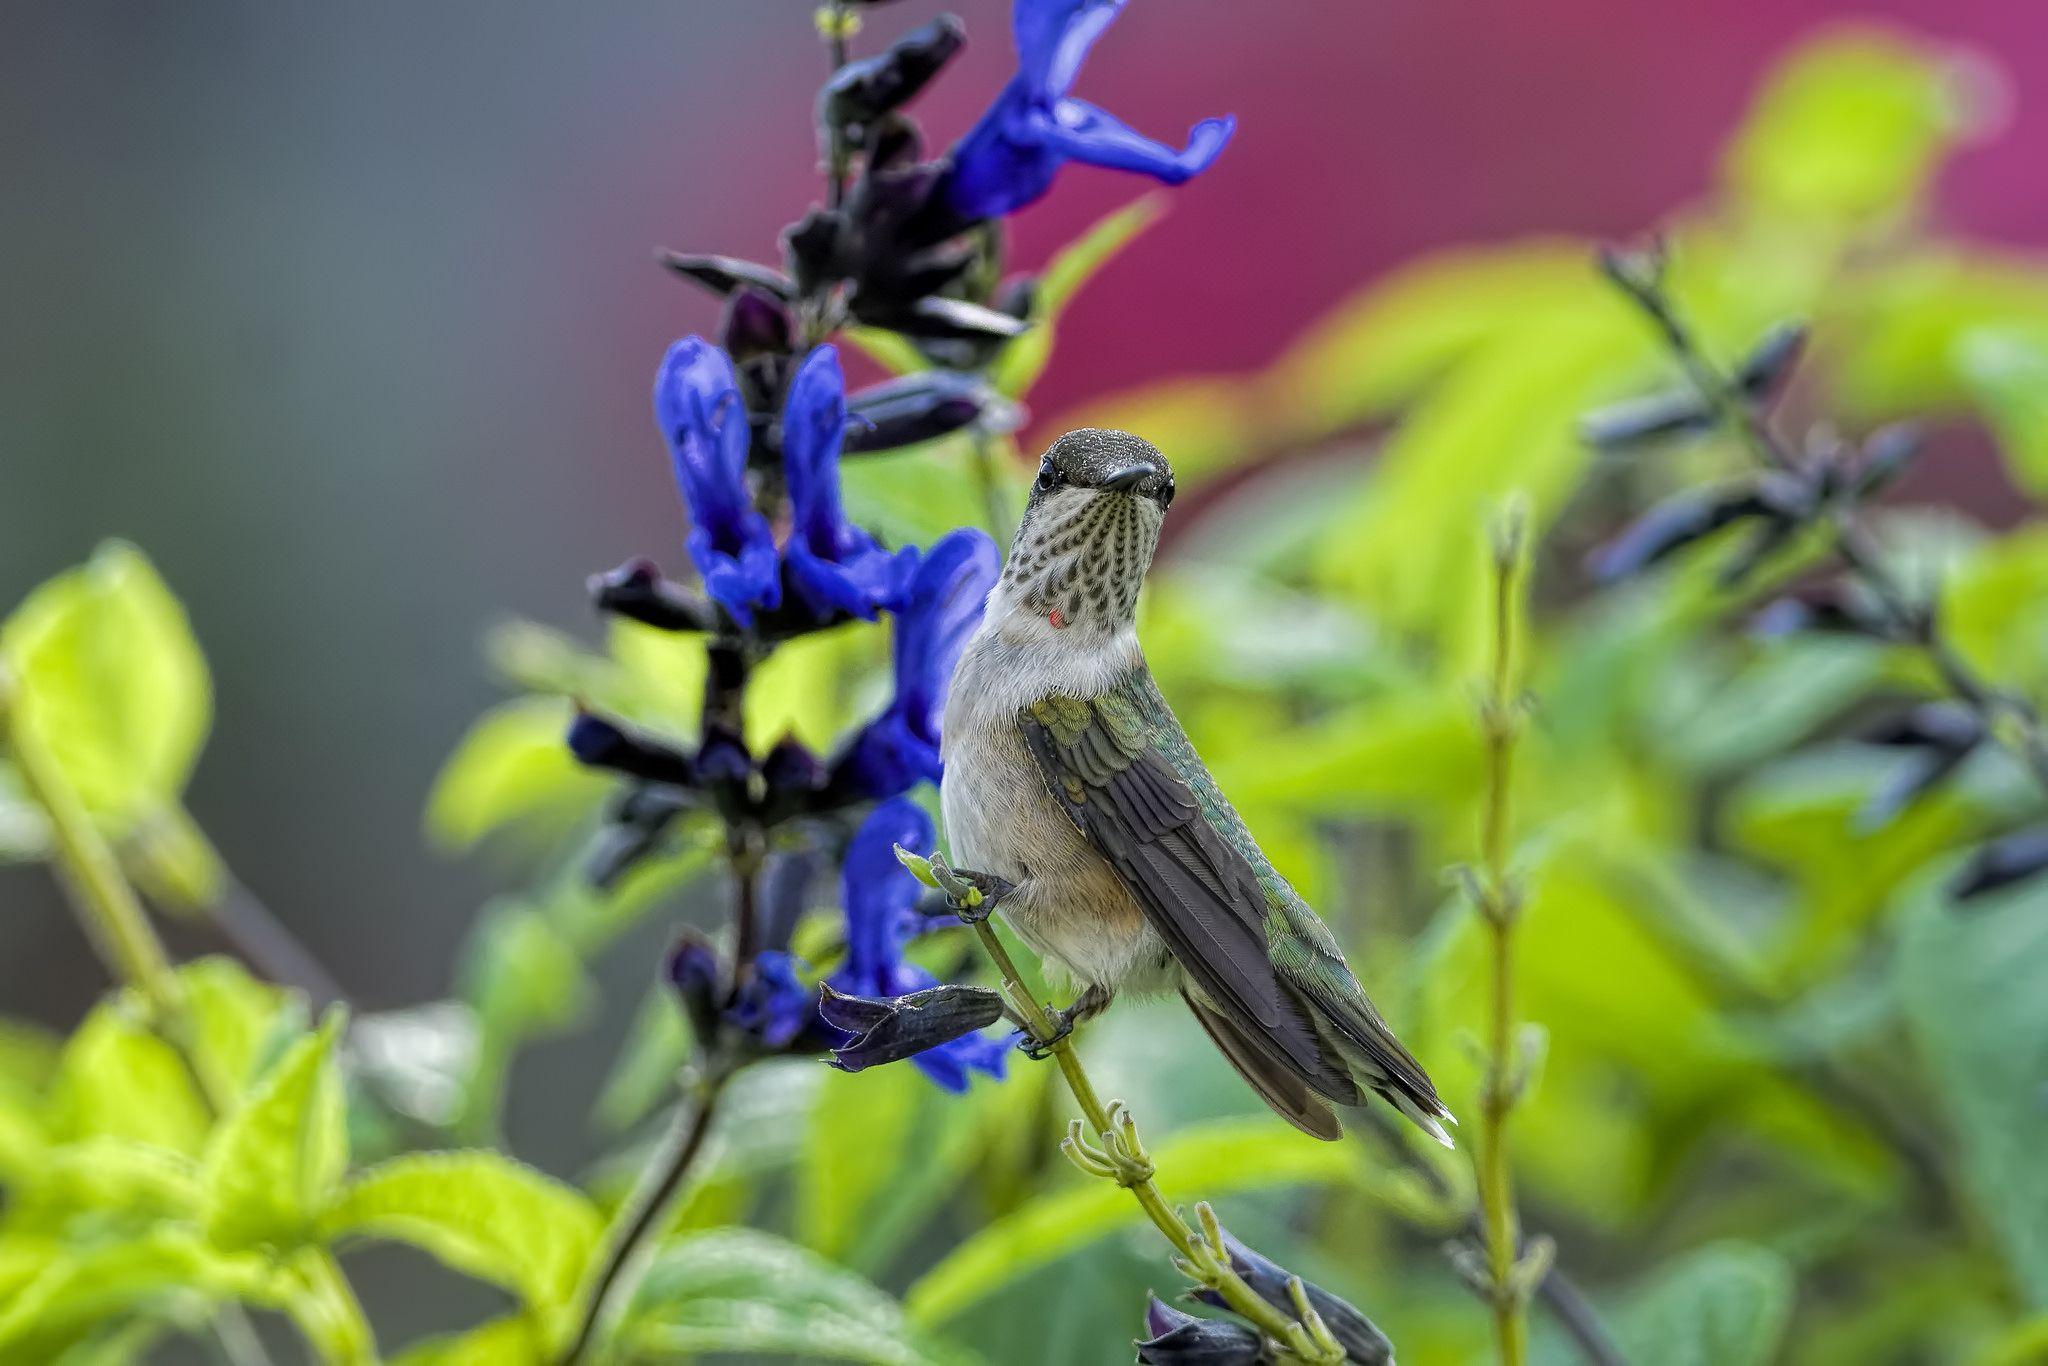 Hummingbird Perched on Salvia_DSC2057 Hummingbird perch